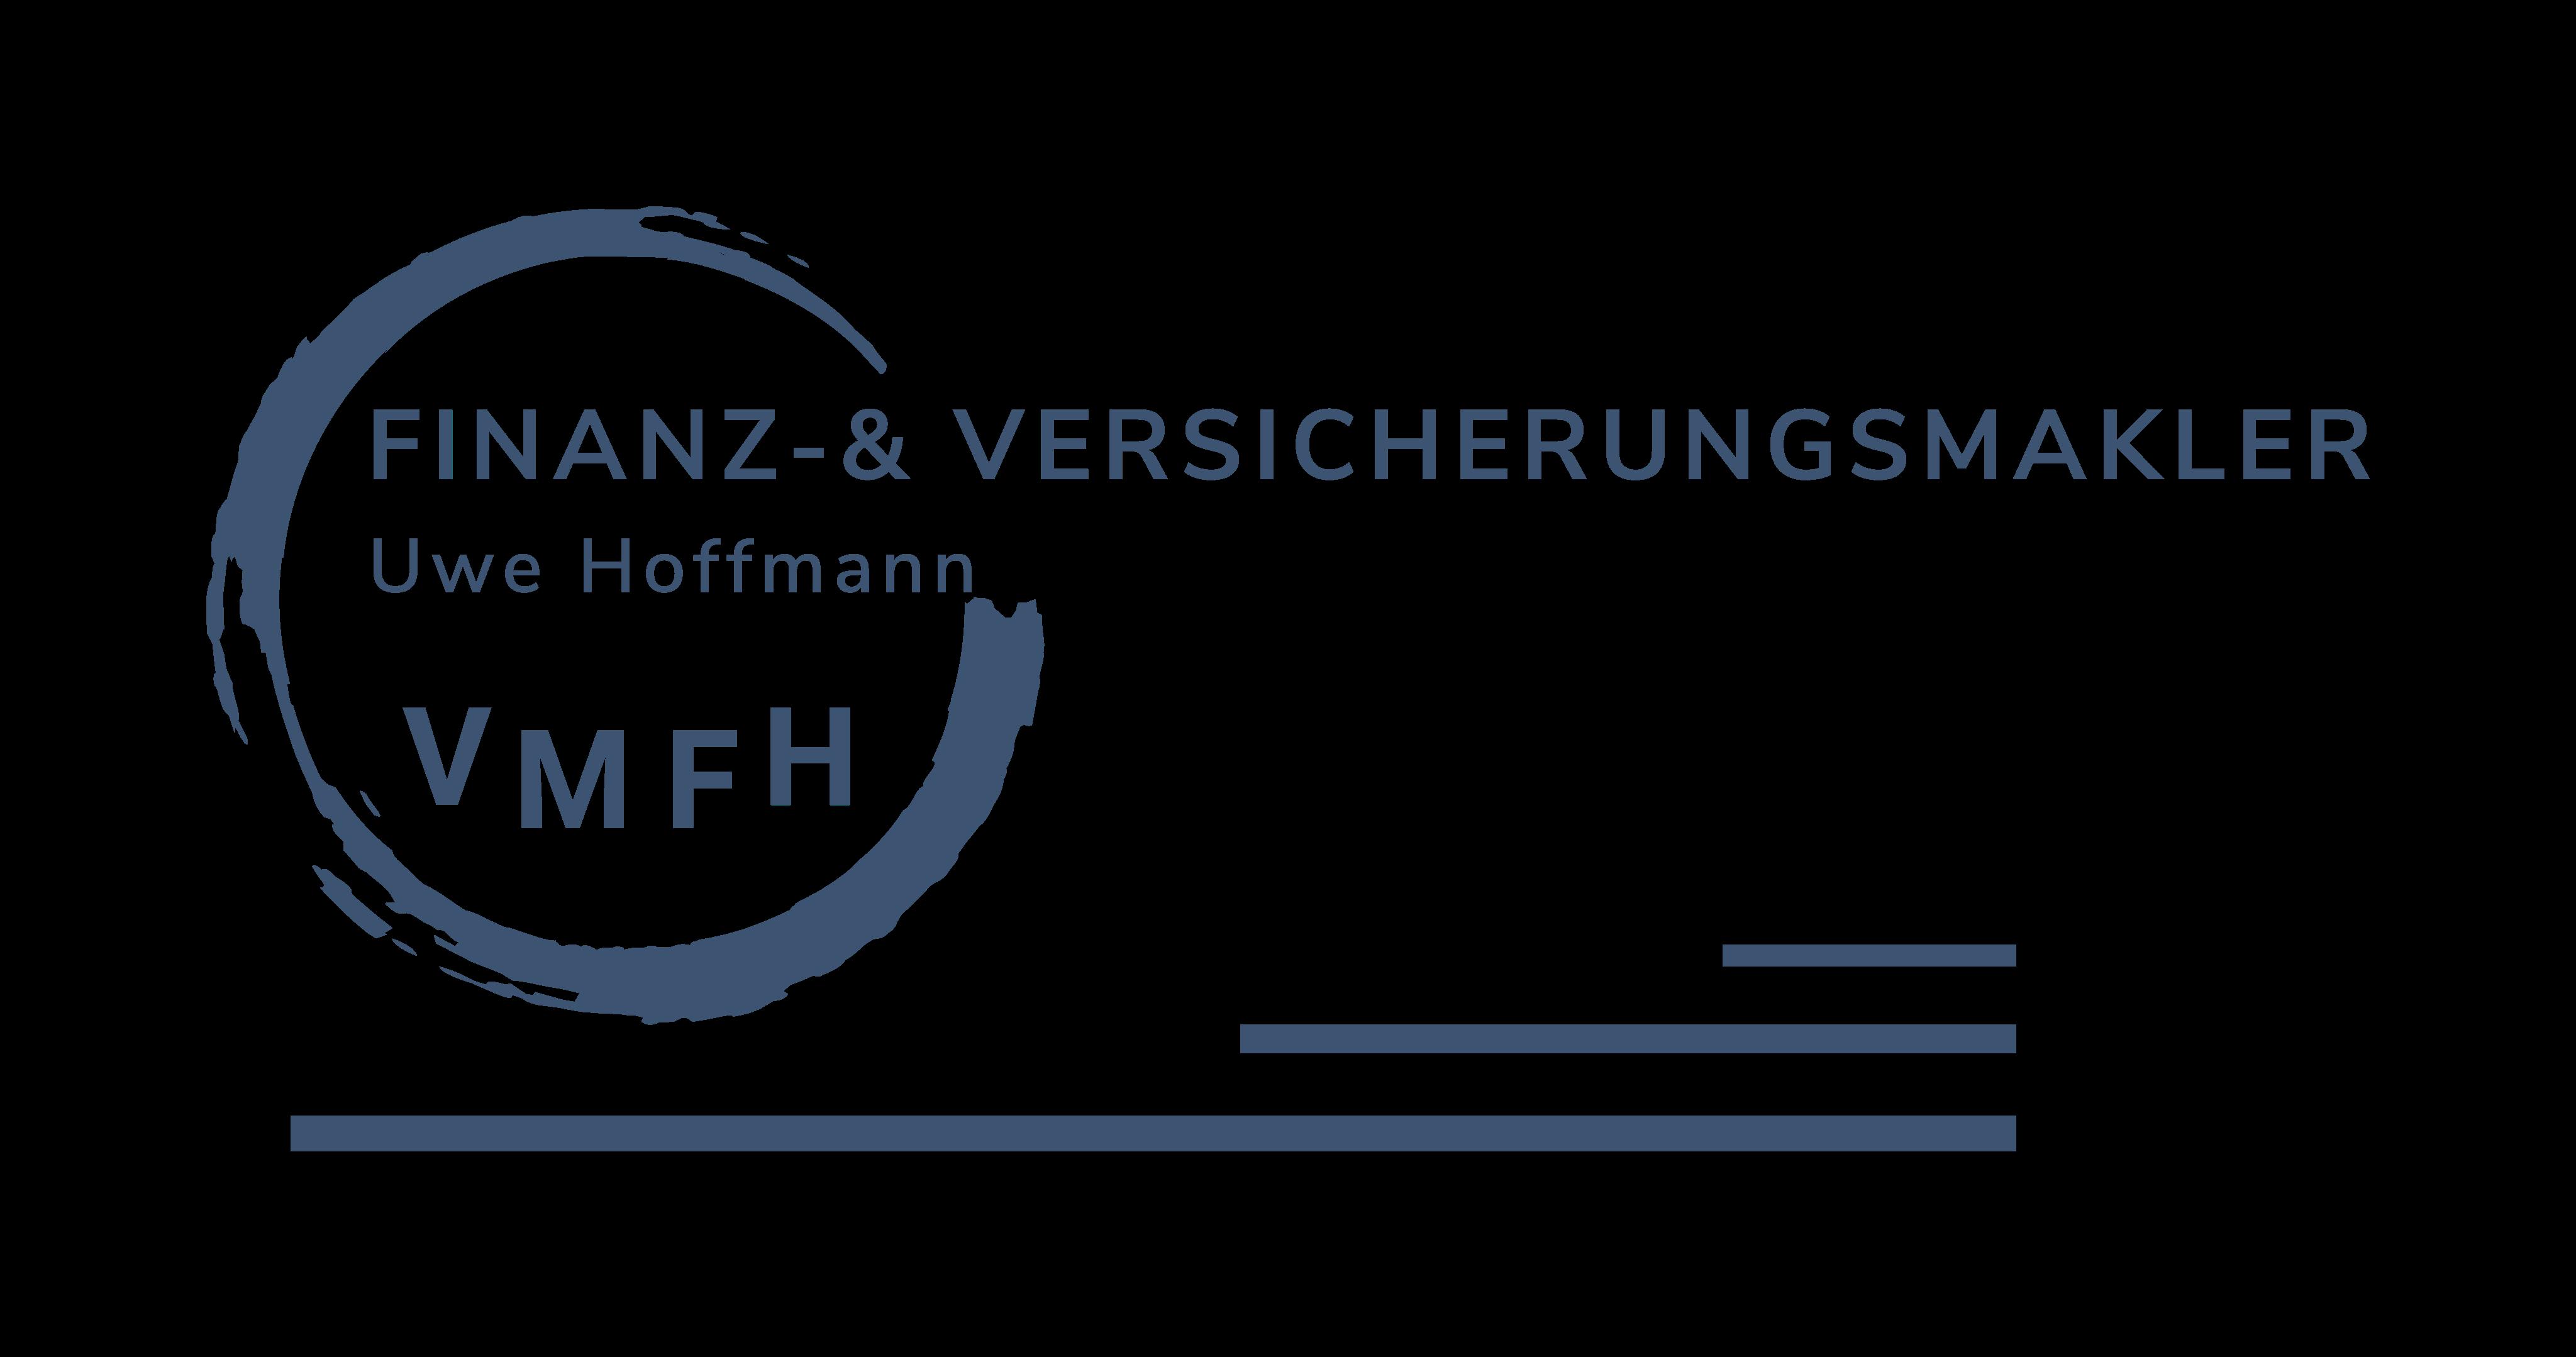 VMFH Finanz- & Versicherungsmakler